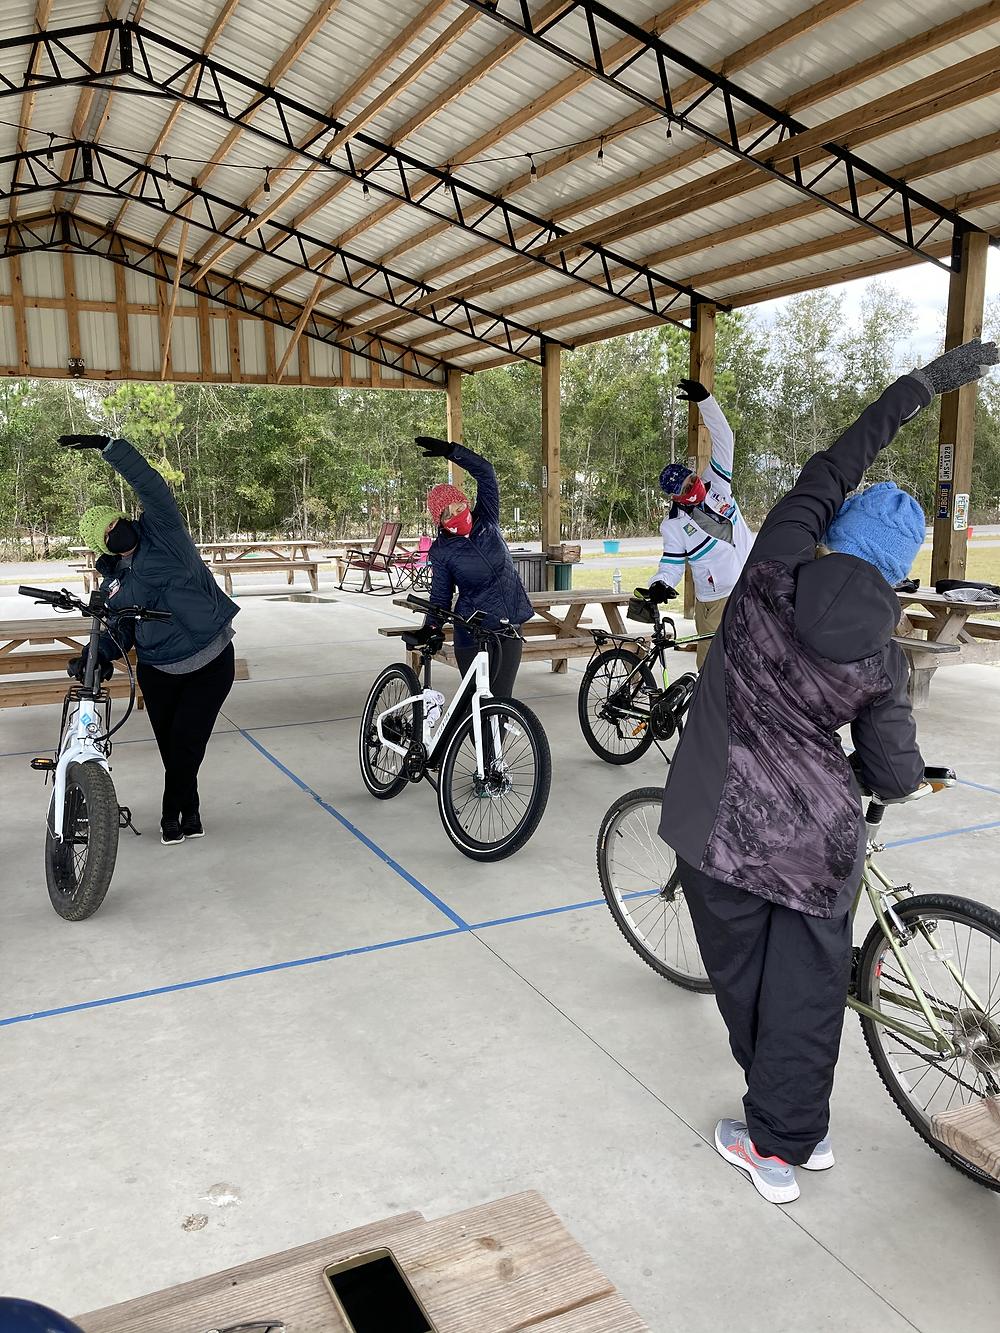 Outdoor yoga: biking stretches